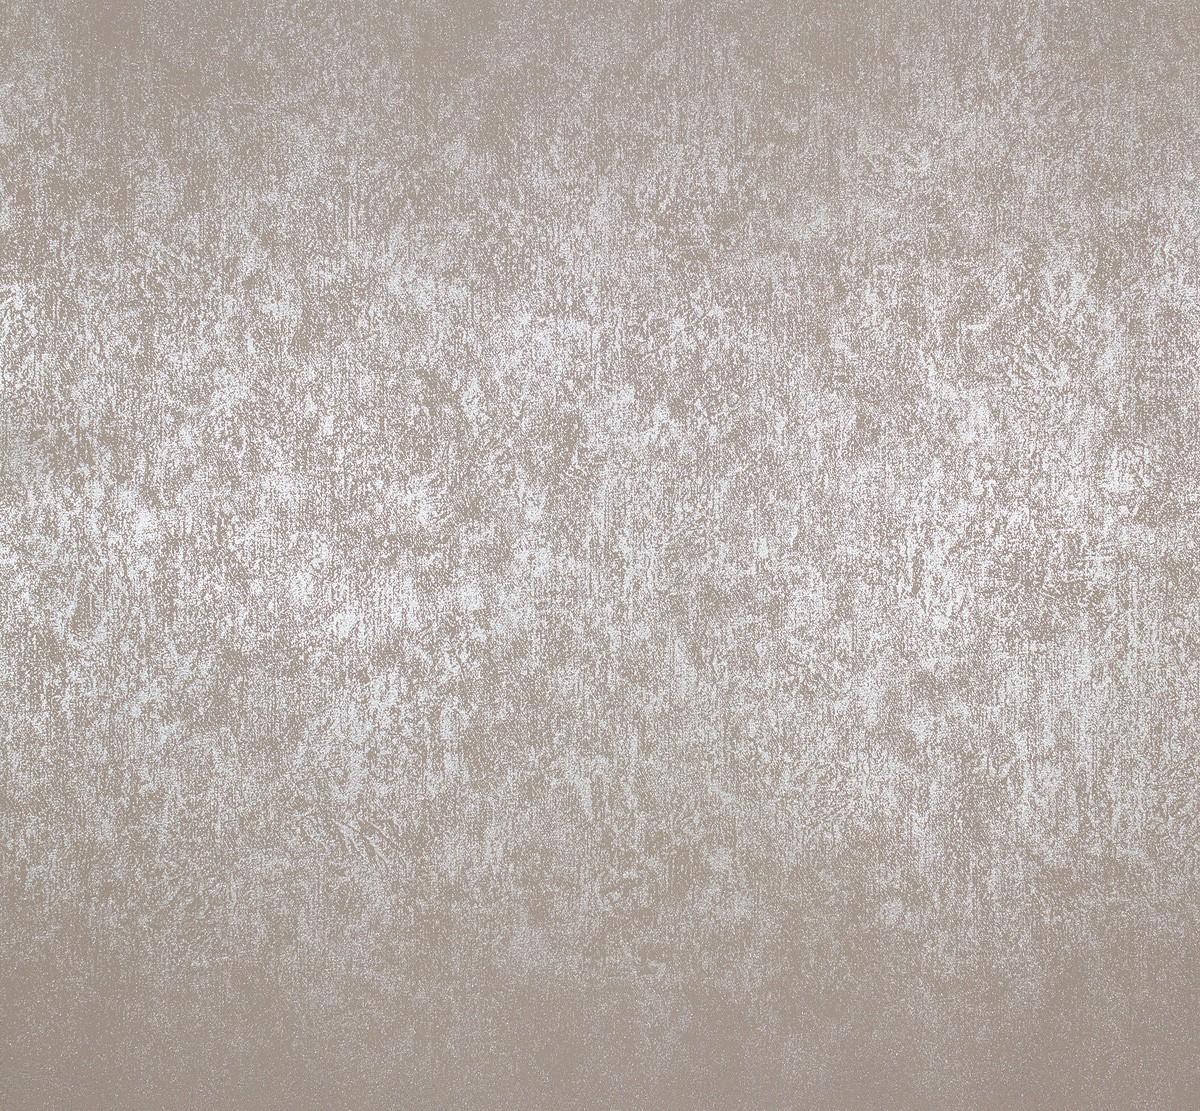 Vliestapete Taupe Grau Struktur Estelle Marburg 55709 001